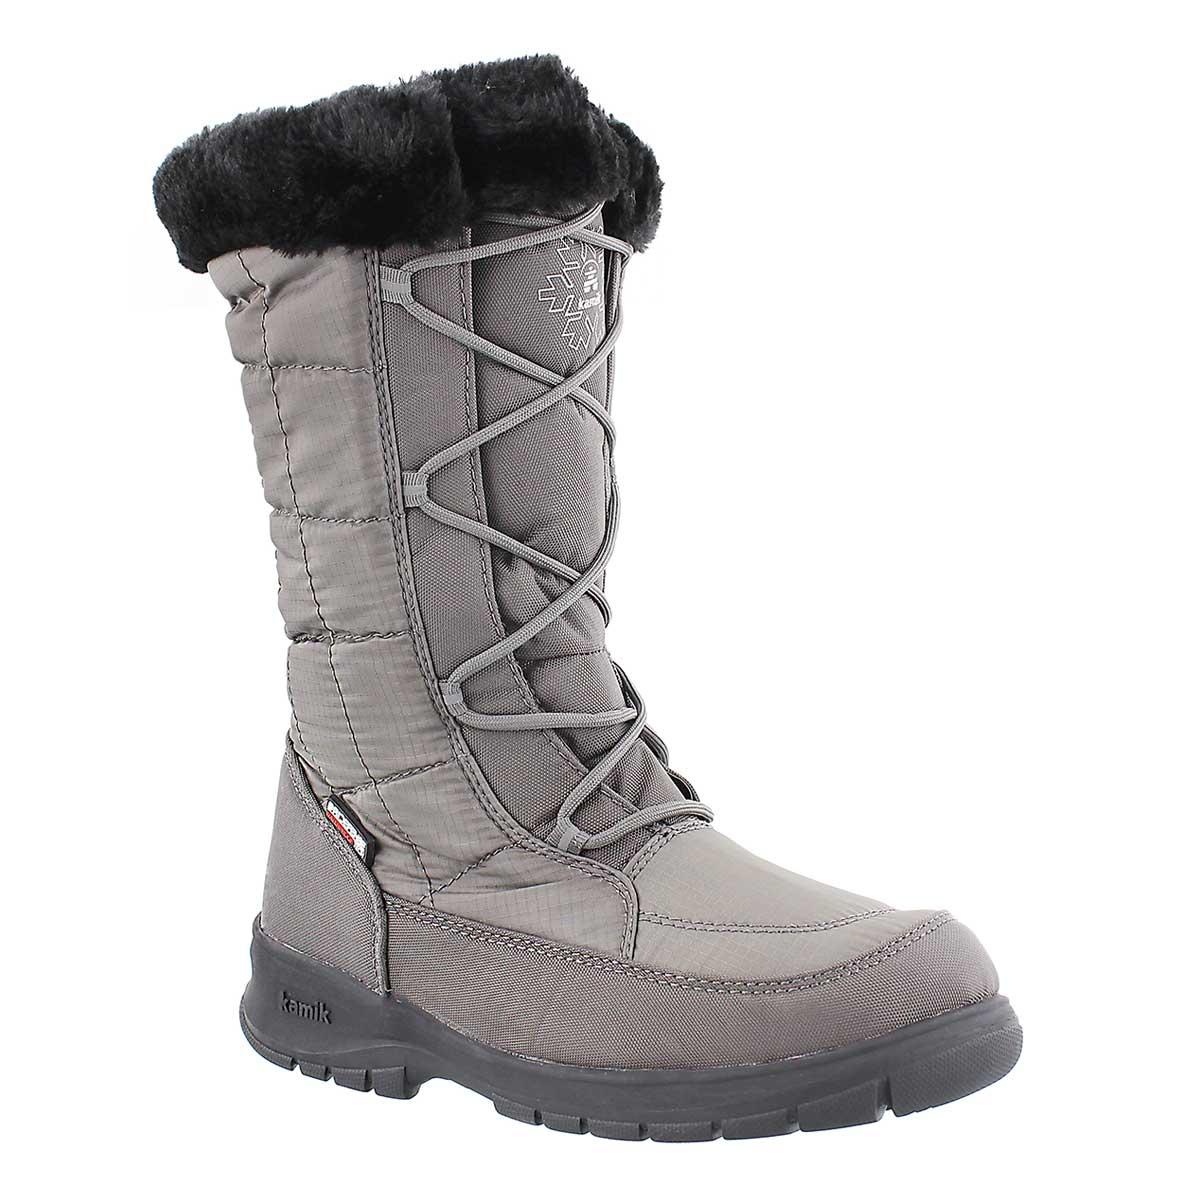 Women's NEW YORK 2 char wtpf winter boots - Wide